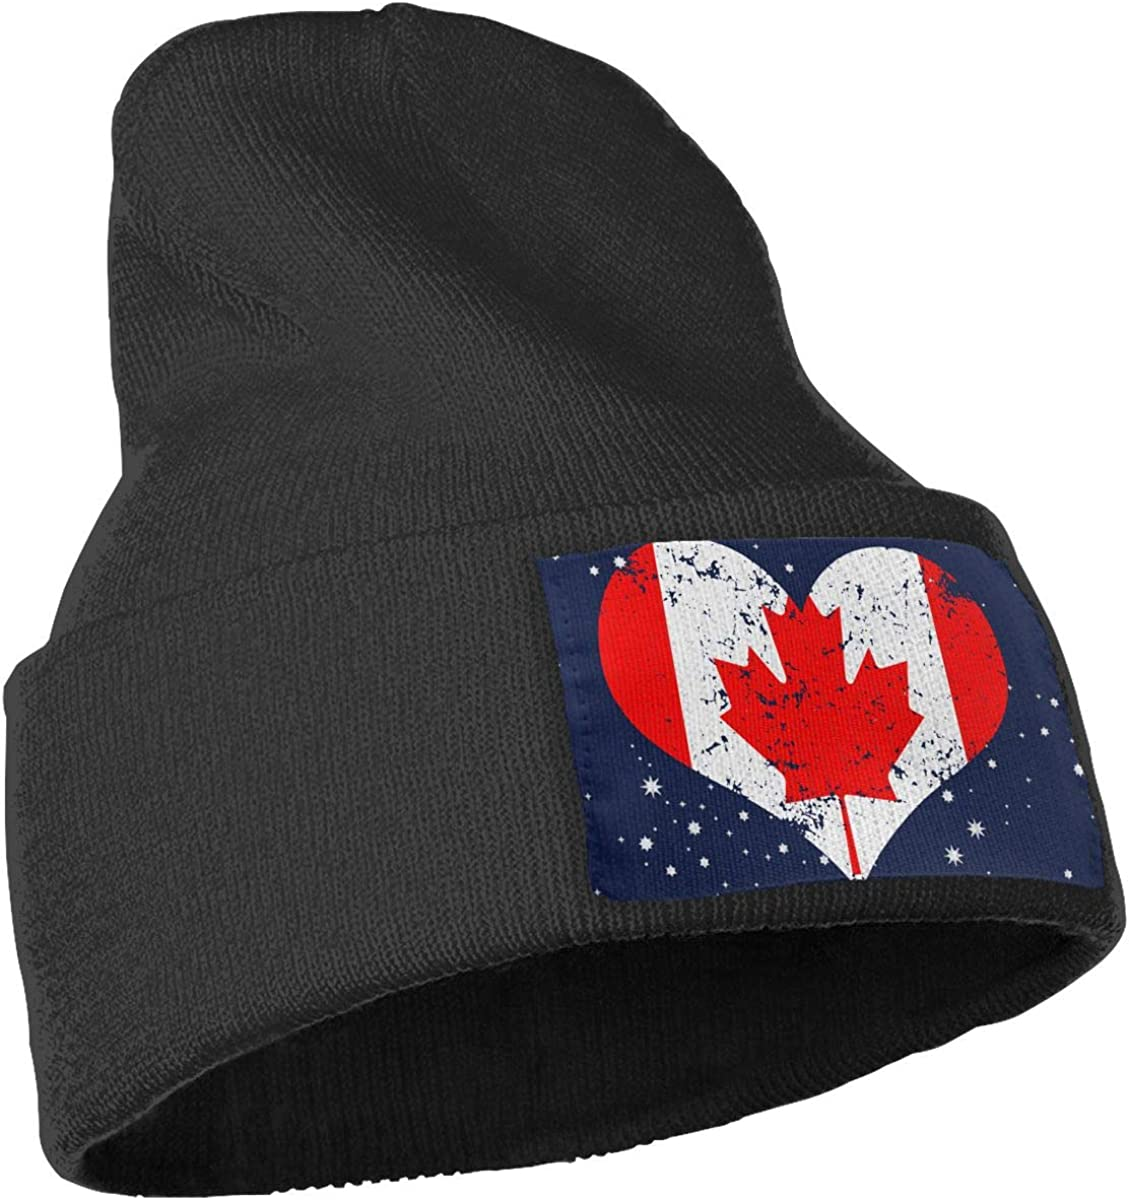 Canada Heart Flag Ski Cap Men /& Women Knitting Hats Stretchy /& Soft Beanie